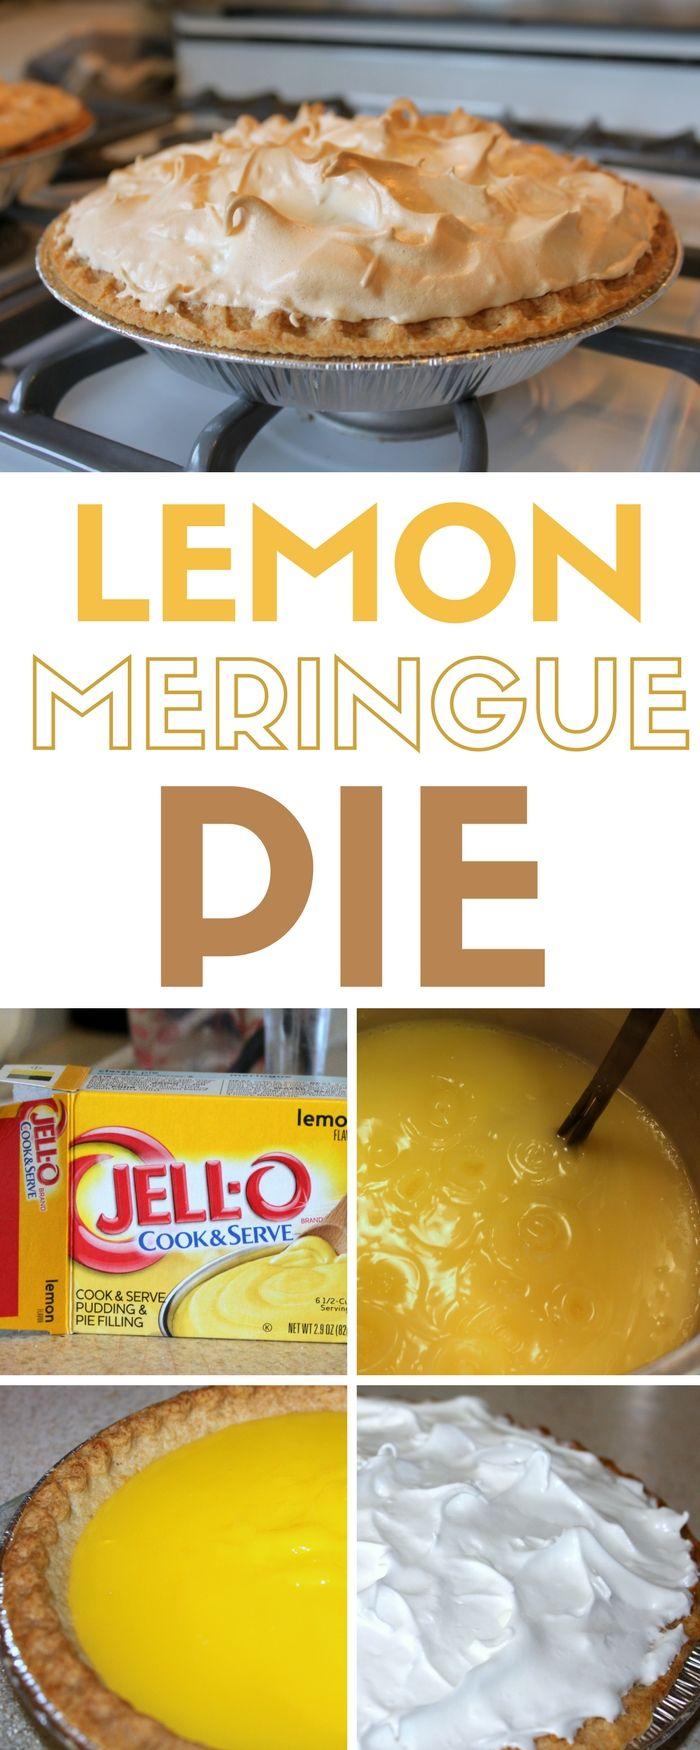 How to Make a Lemon Meringue Pie #lemonmeringuepie